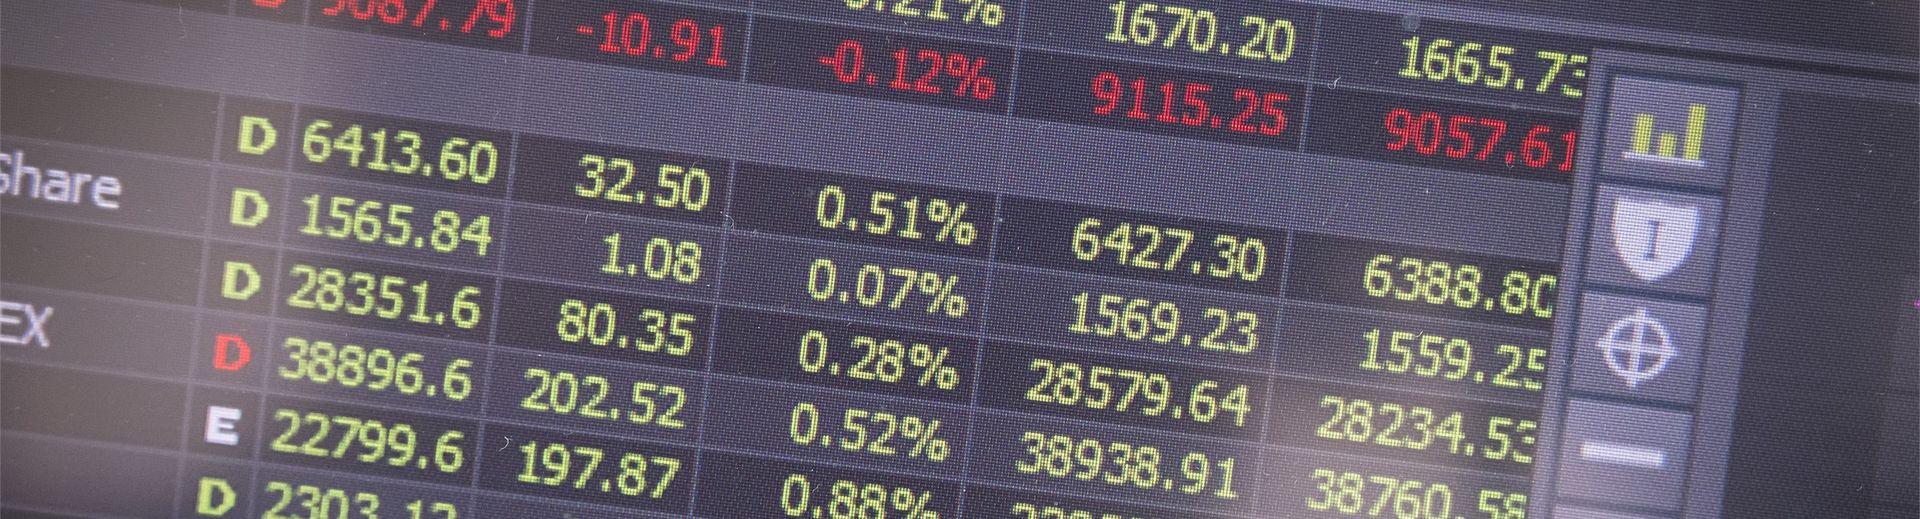 Financial data on a computer screen.